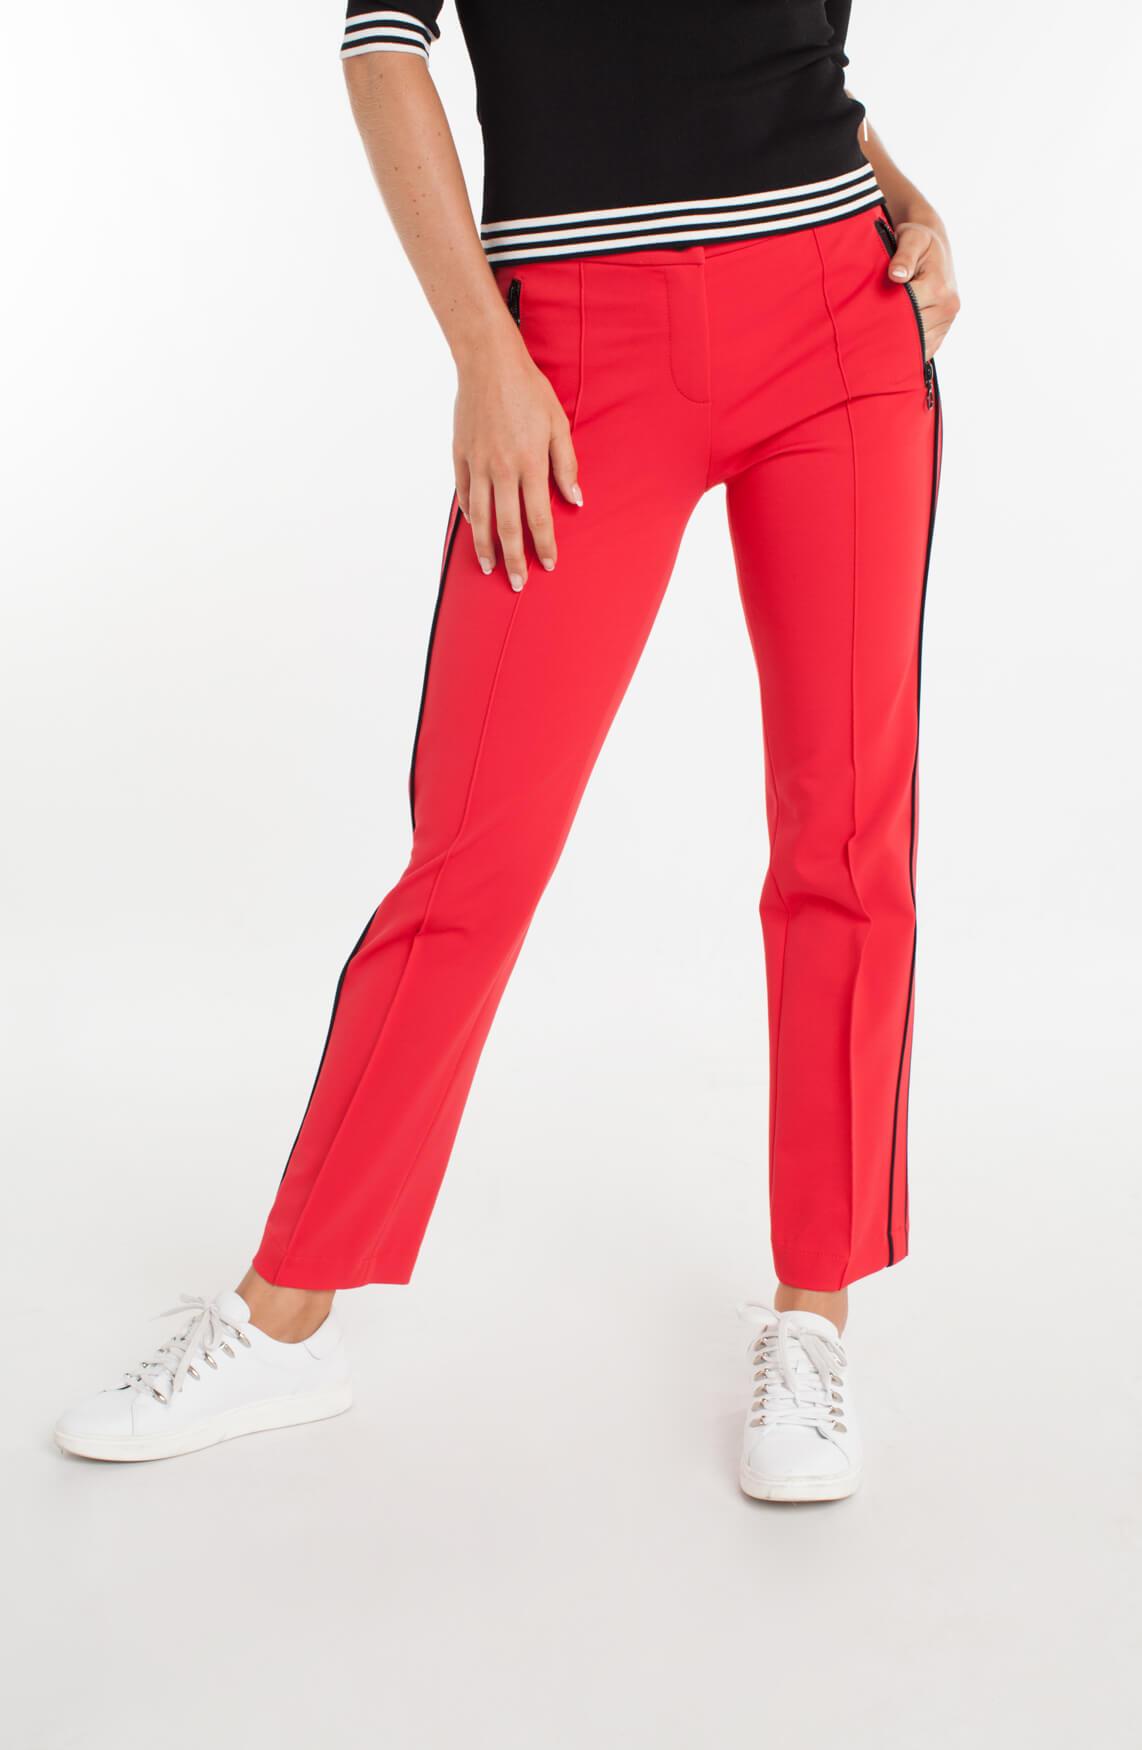 Rosner Dames Alisa pantalon Rood